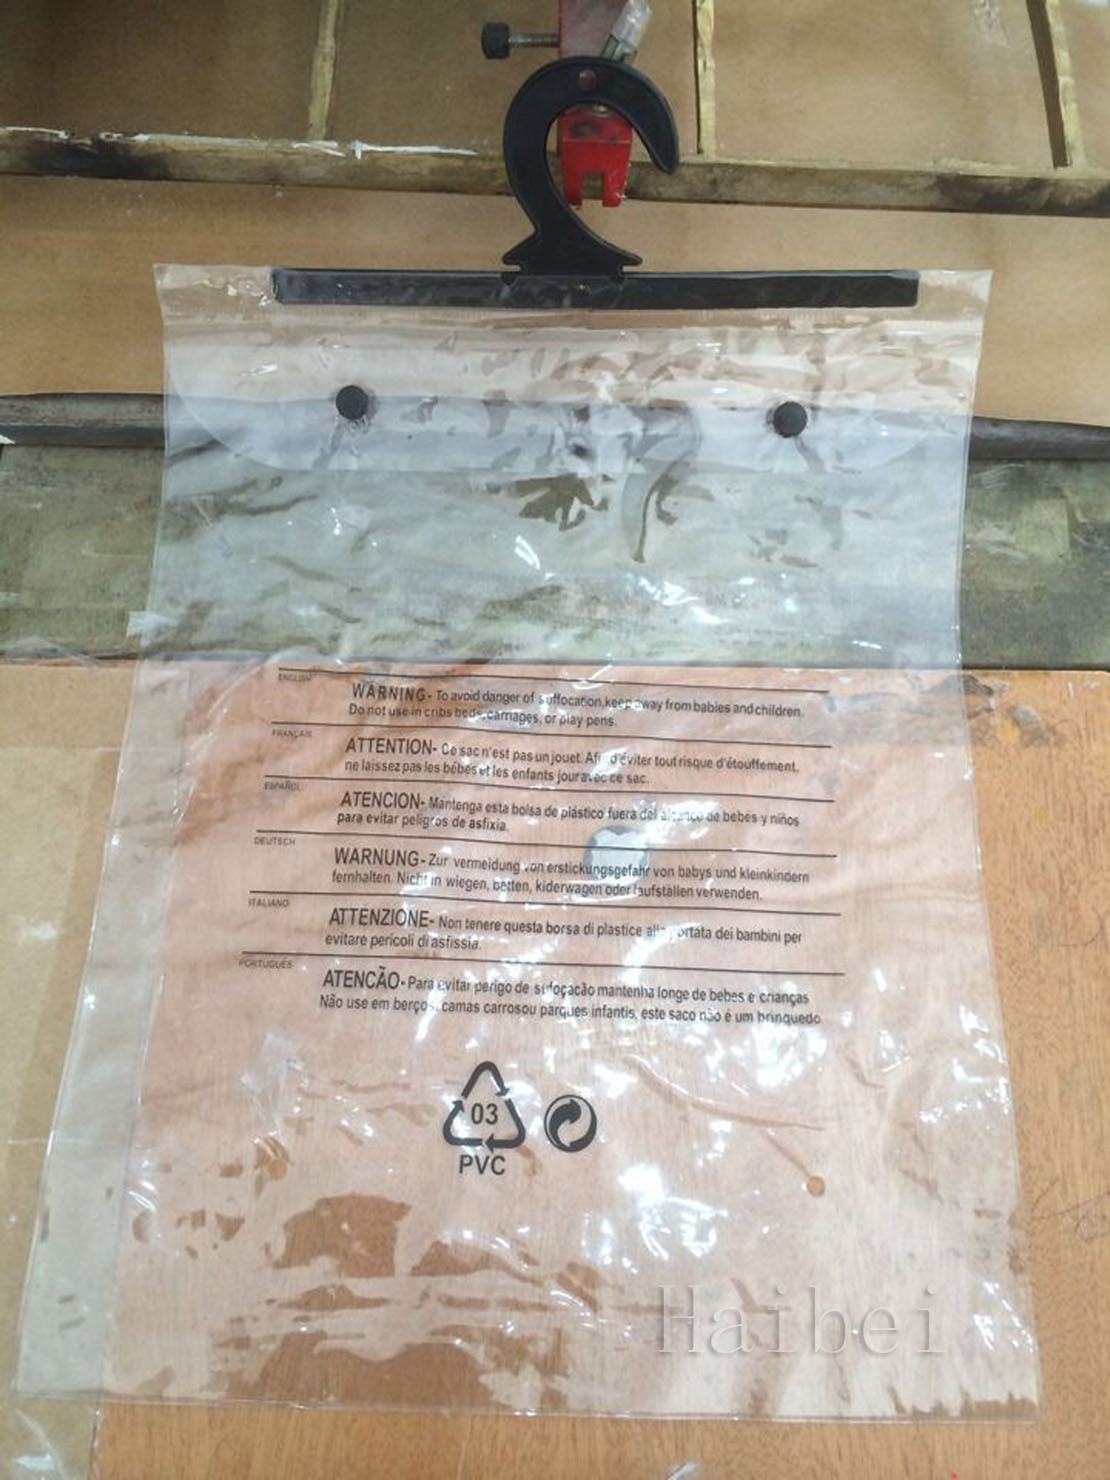 Customized Printed PVC Bag, Plastic Package Bag with Hook, PVC Button Bag, PVC Underwear Bag, PVC Garment Bag, PVC Hanger Bag (hbpv-74)